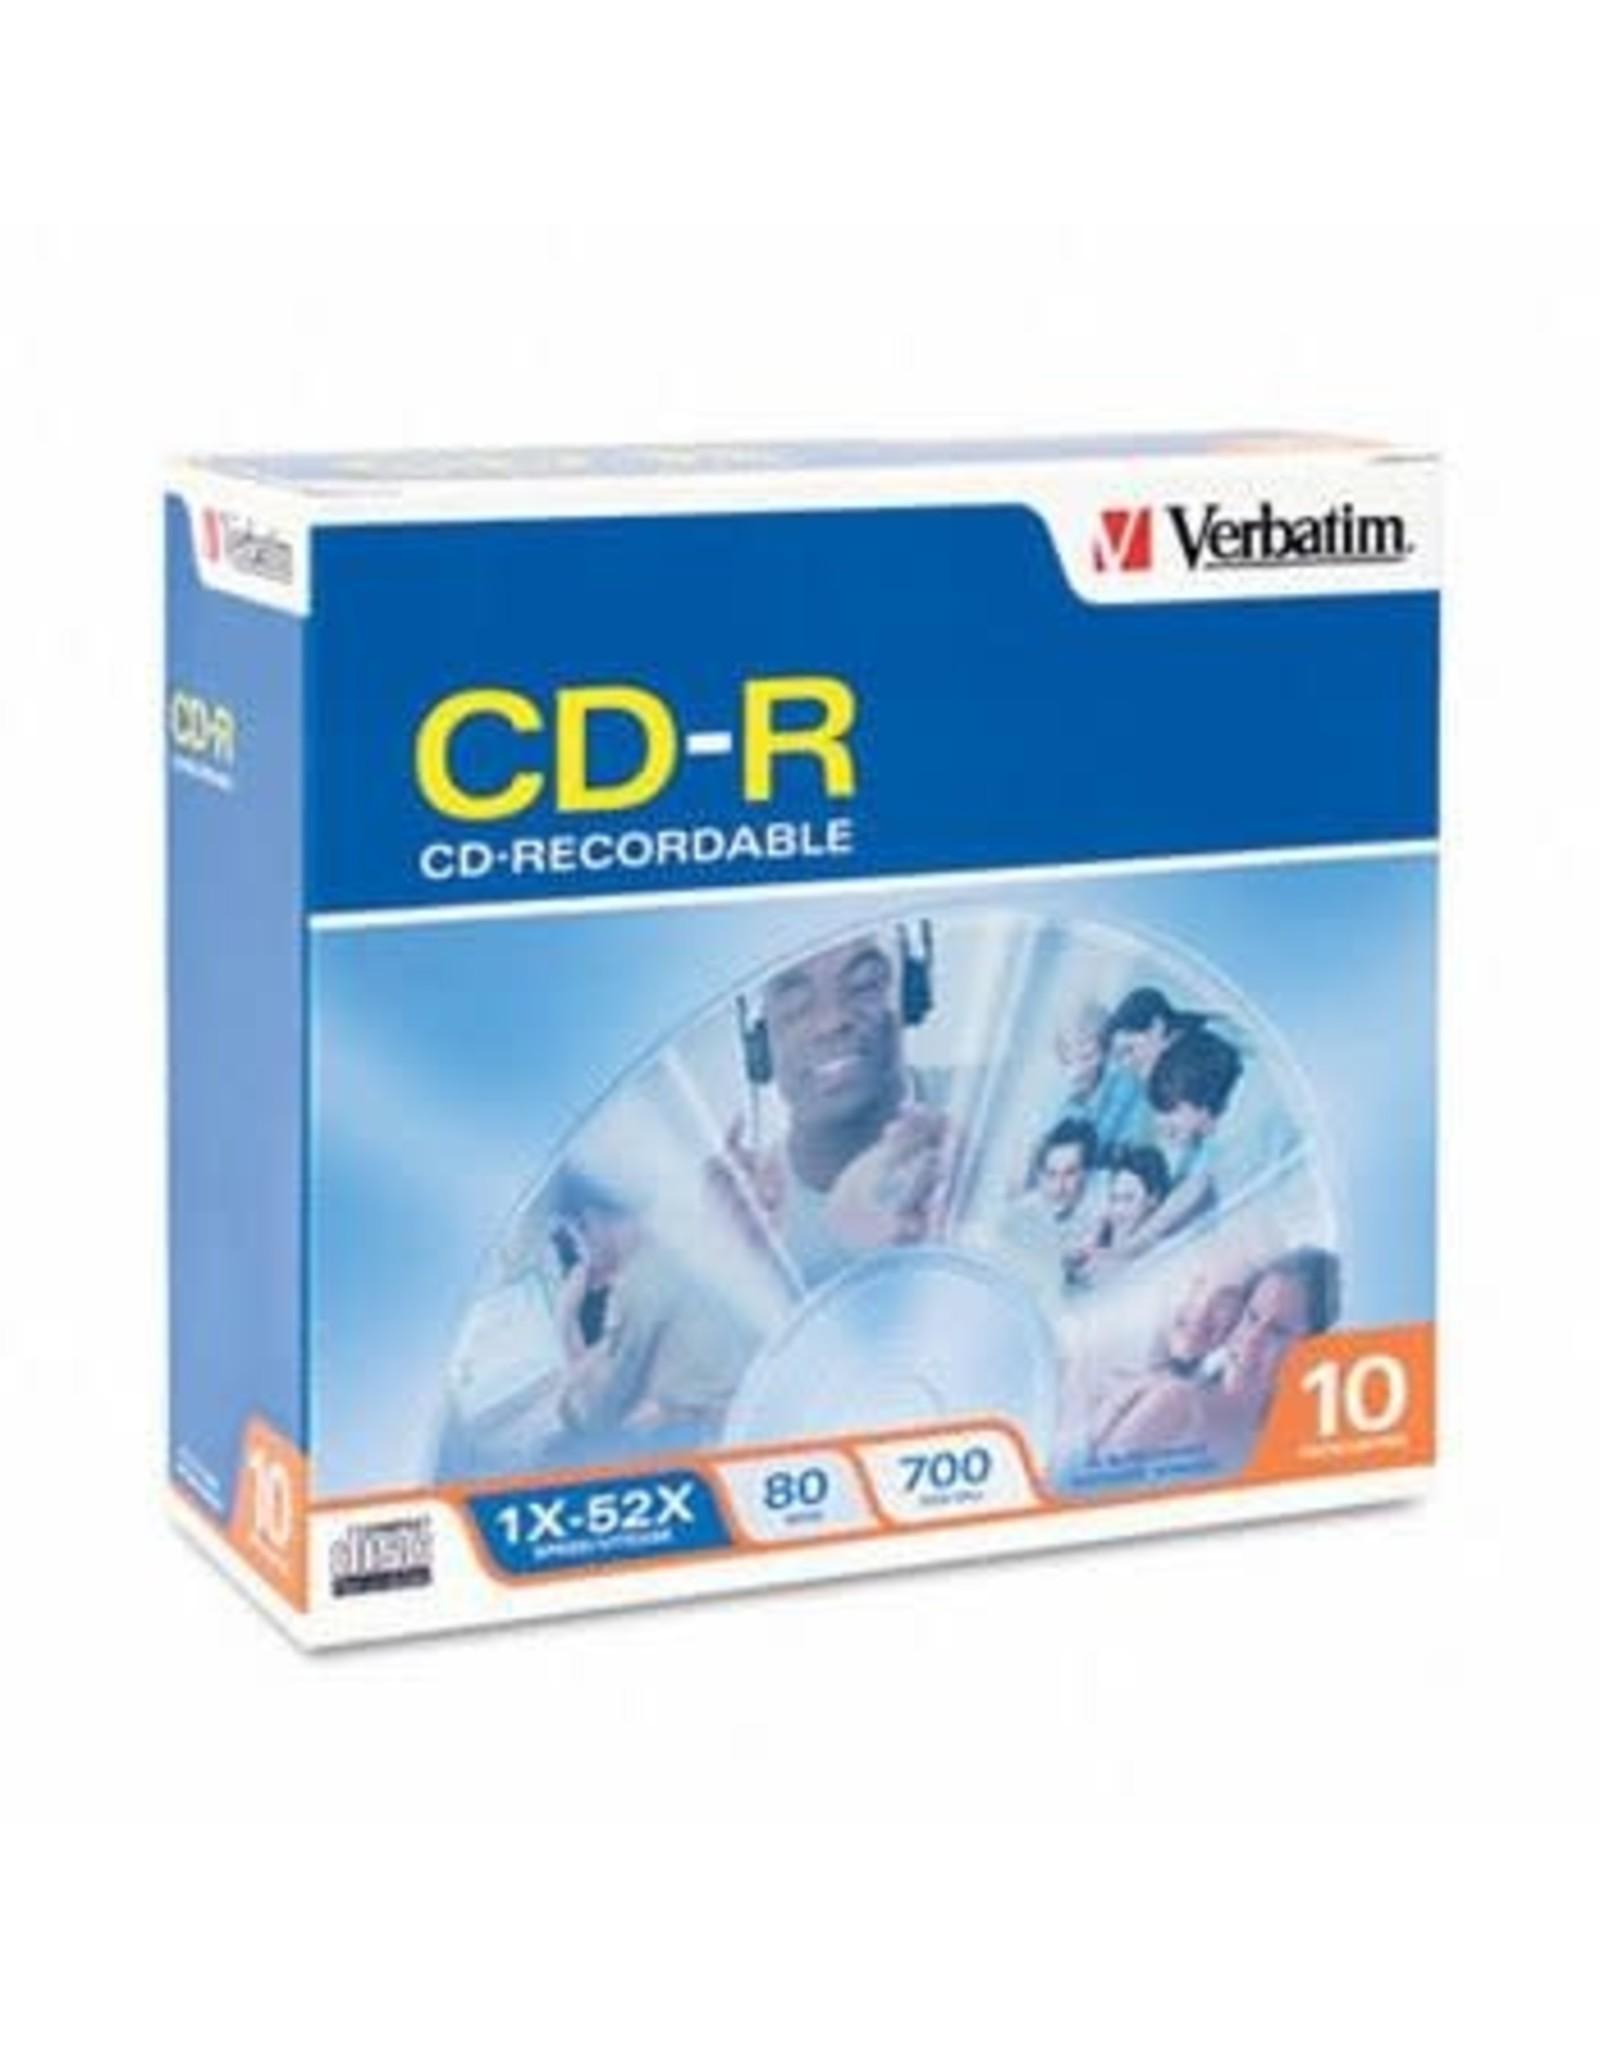 Verbatim CD-R 10-PACK 700MB 52X 80MIN.